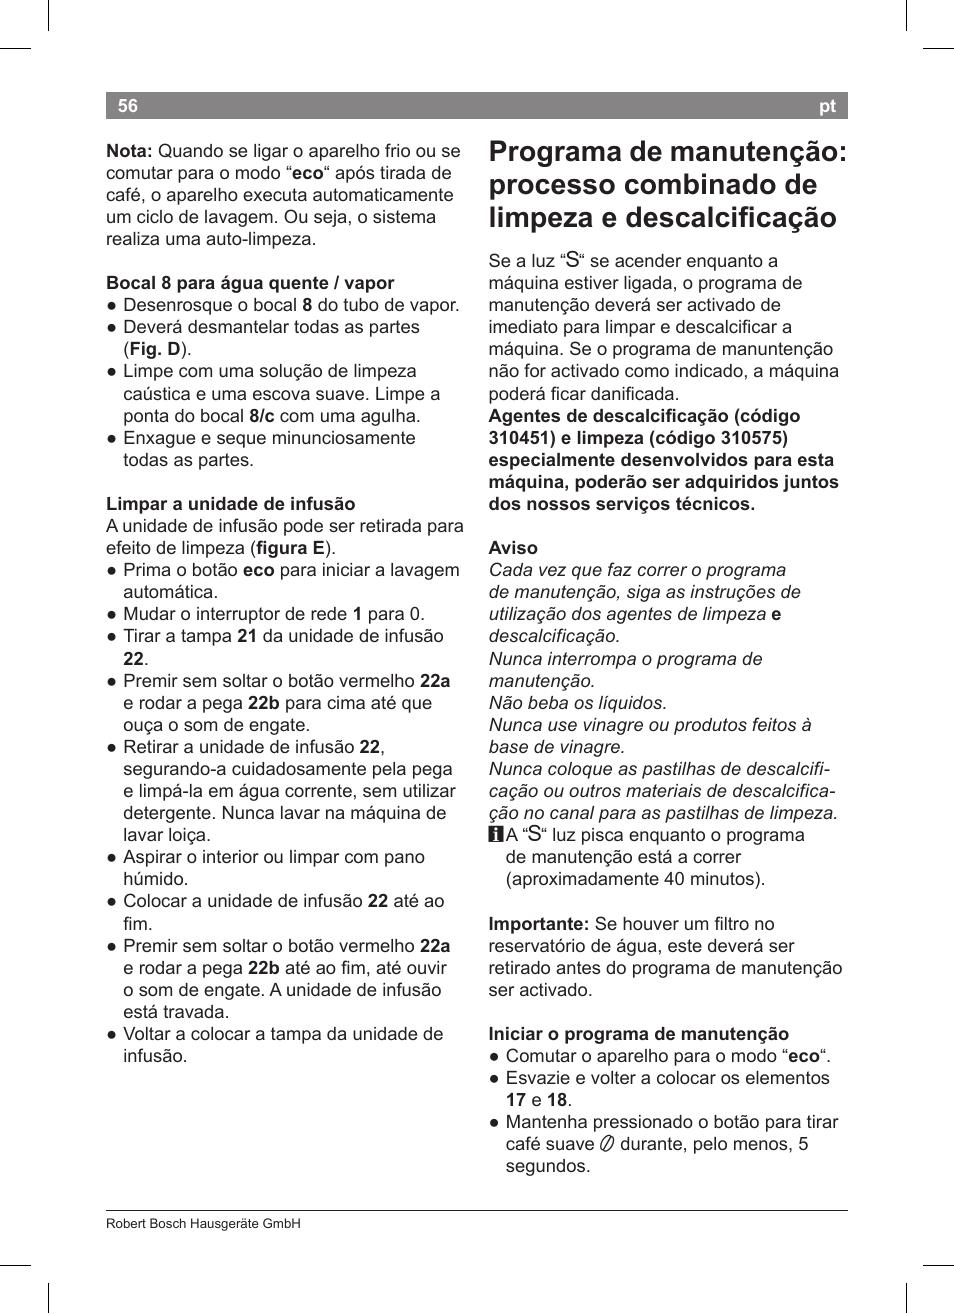 Bosch tca 5201 user manual | page 60 / 100 | original mode.